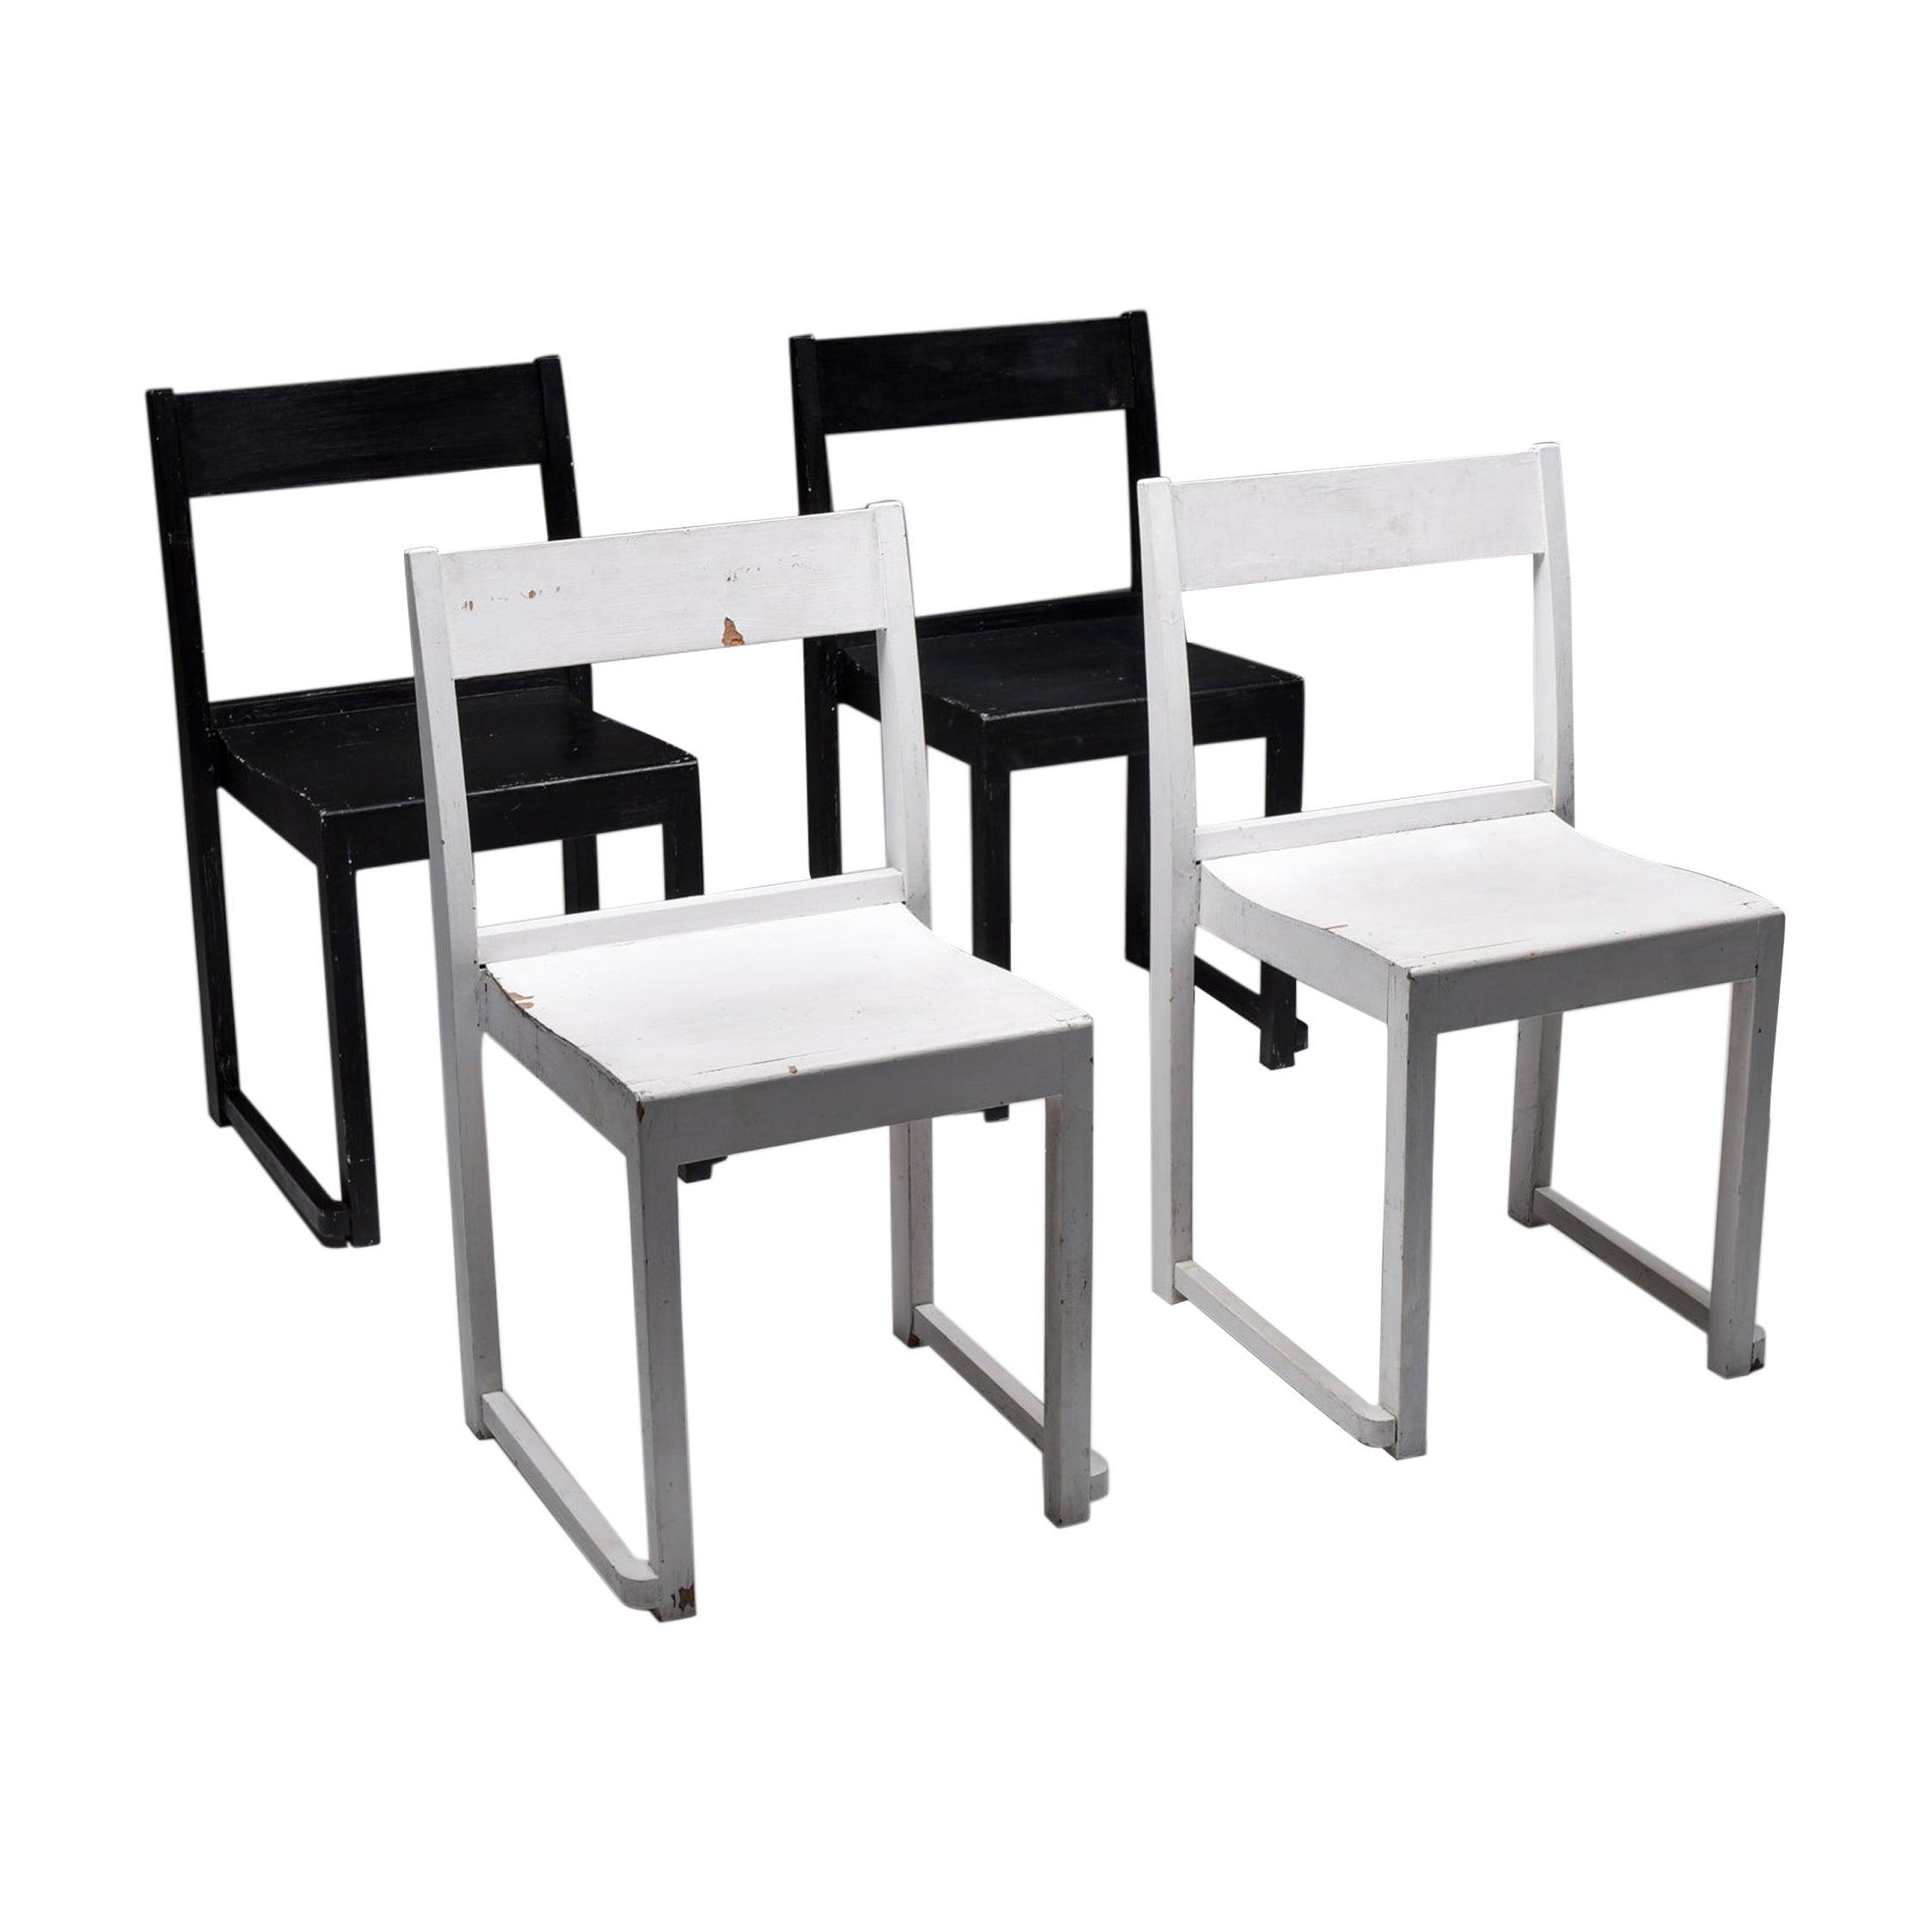 Sven Markelius 'Orchestra' Chairs Black & White